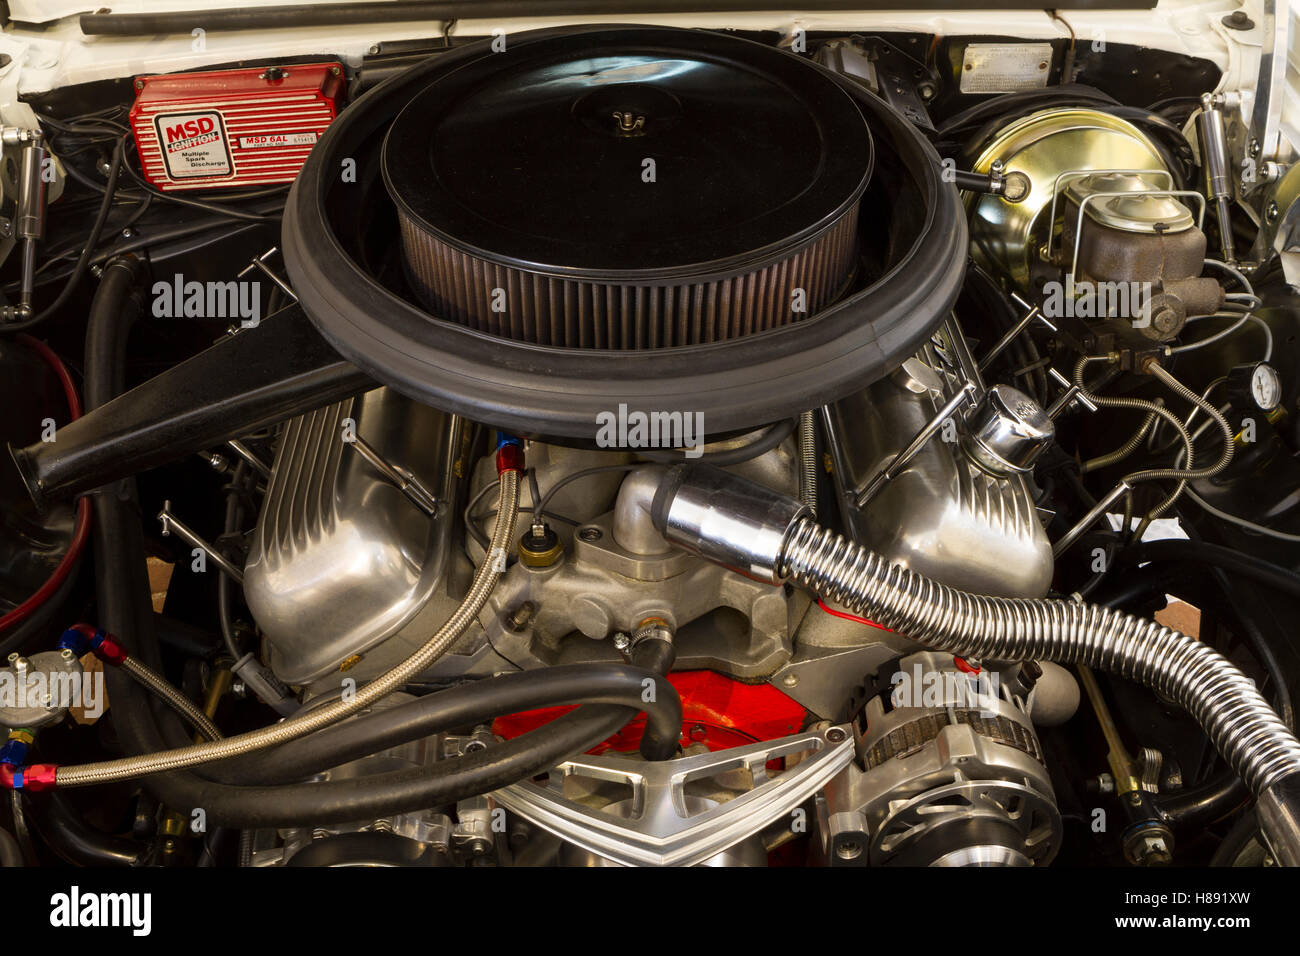 Chevrolet Camaro Engine Stock Photos & Chevrolet Camaro Engine Stock ...